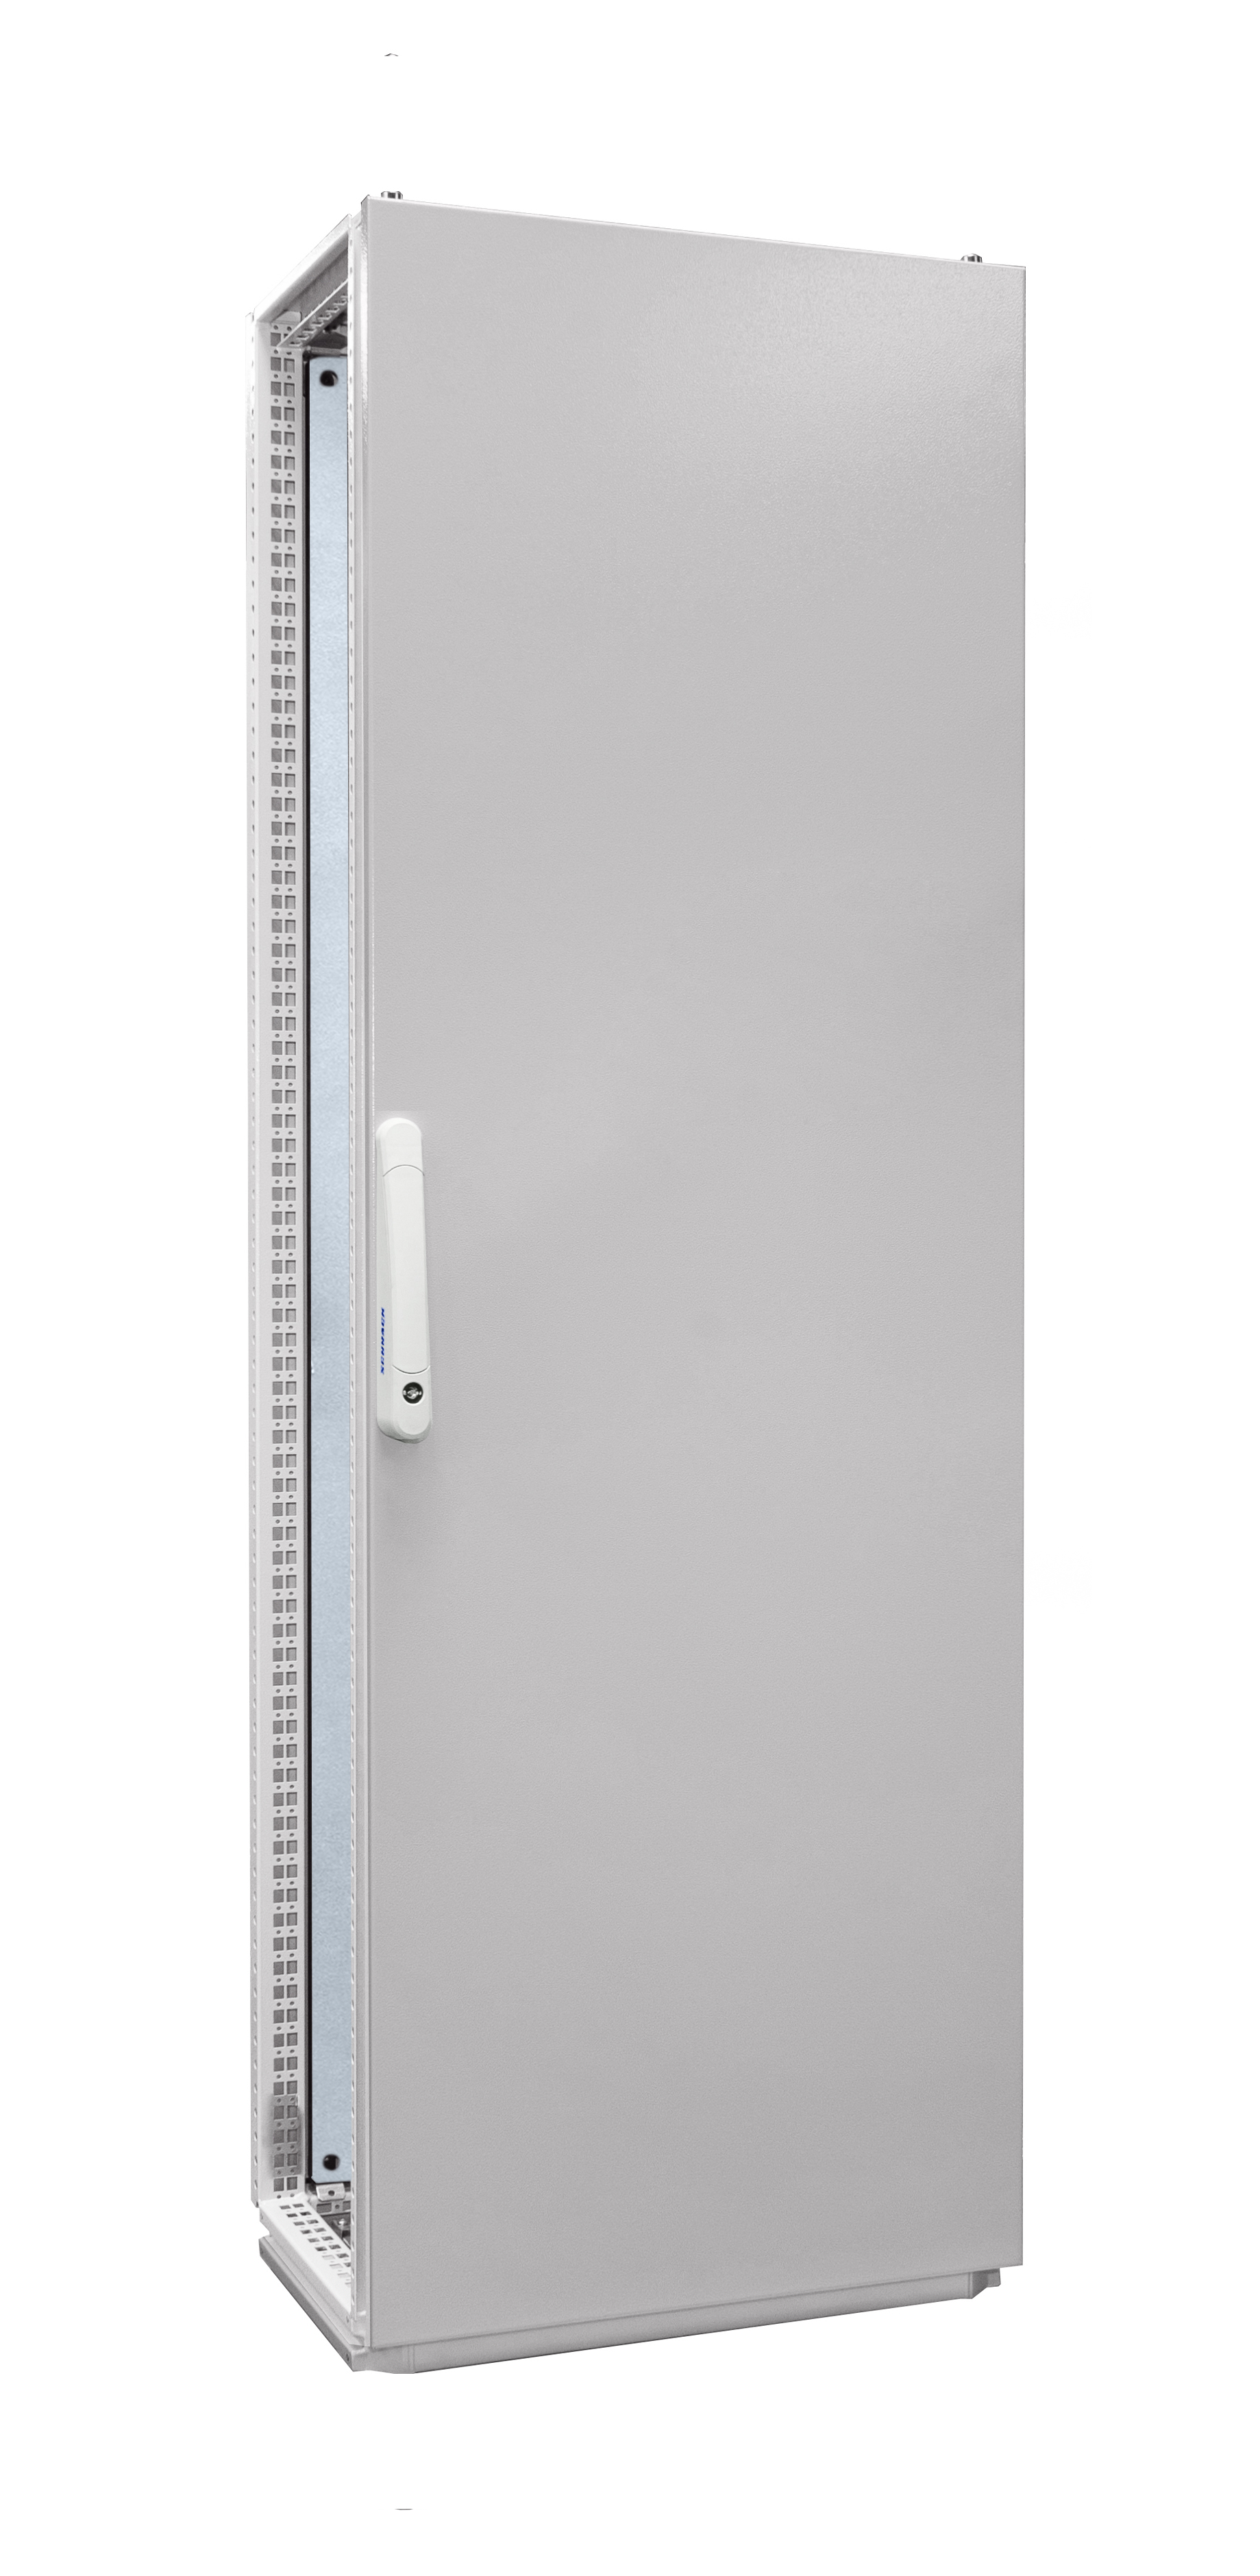 1 Stk Anreihschrank 1-Tür IP55 H=1800 B=600 T=400mm Stahlblech AC186040--